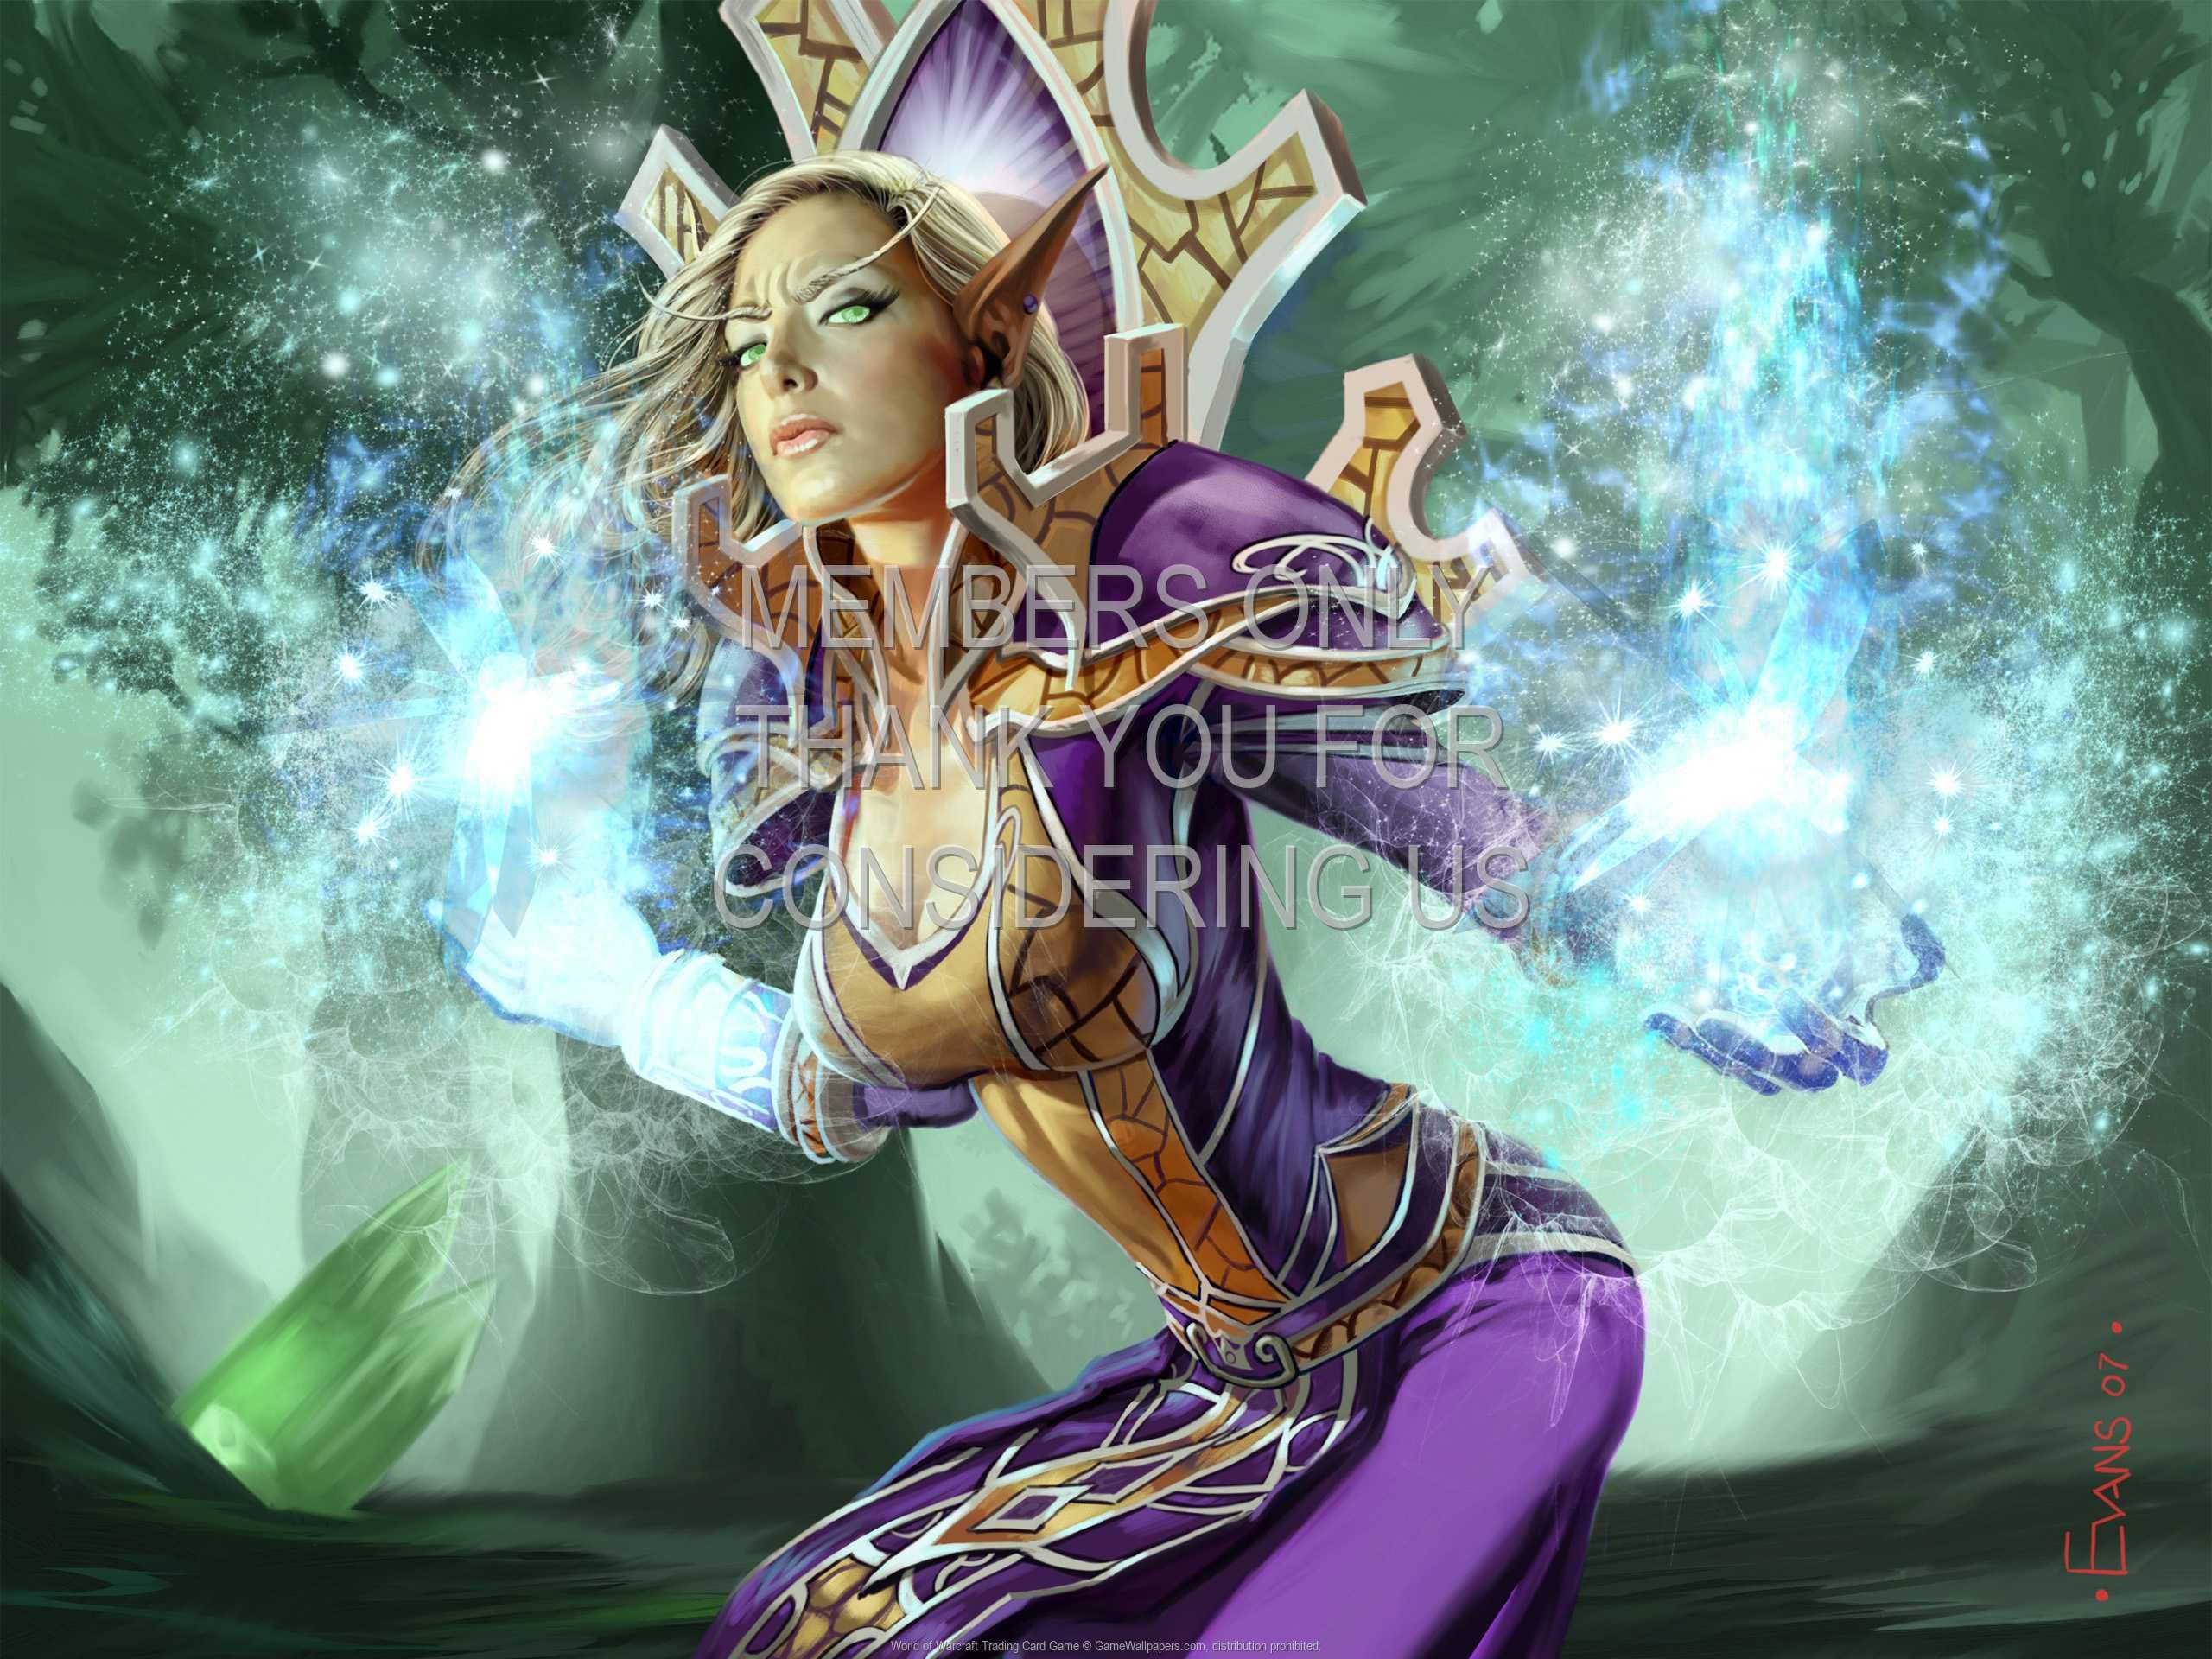 World of Warcraft: Trading Card Game 1080p Horizontal Handy Hintergrundbild 46